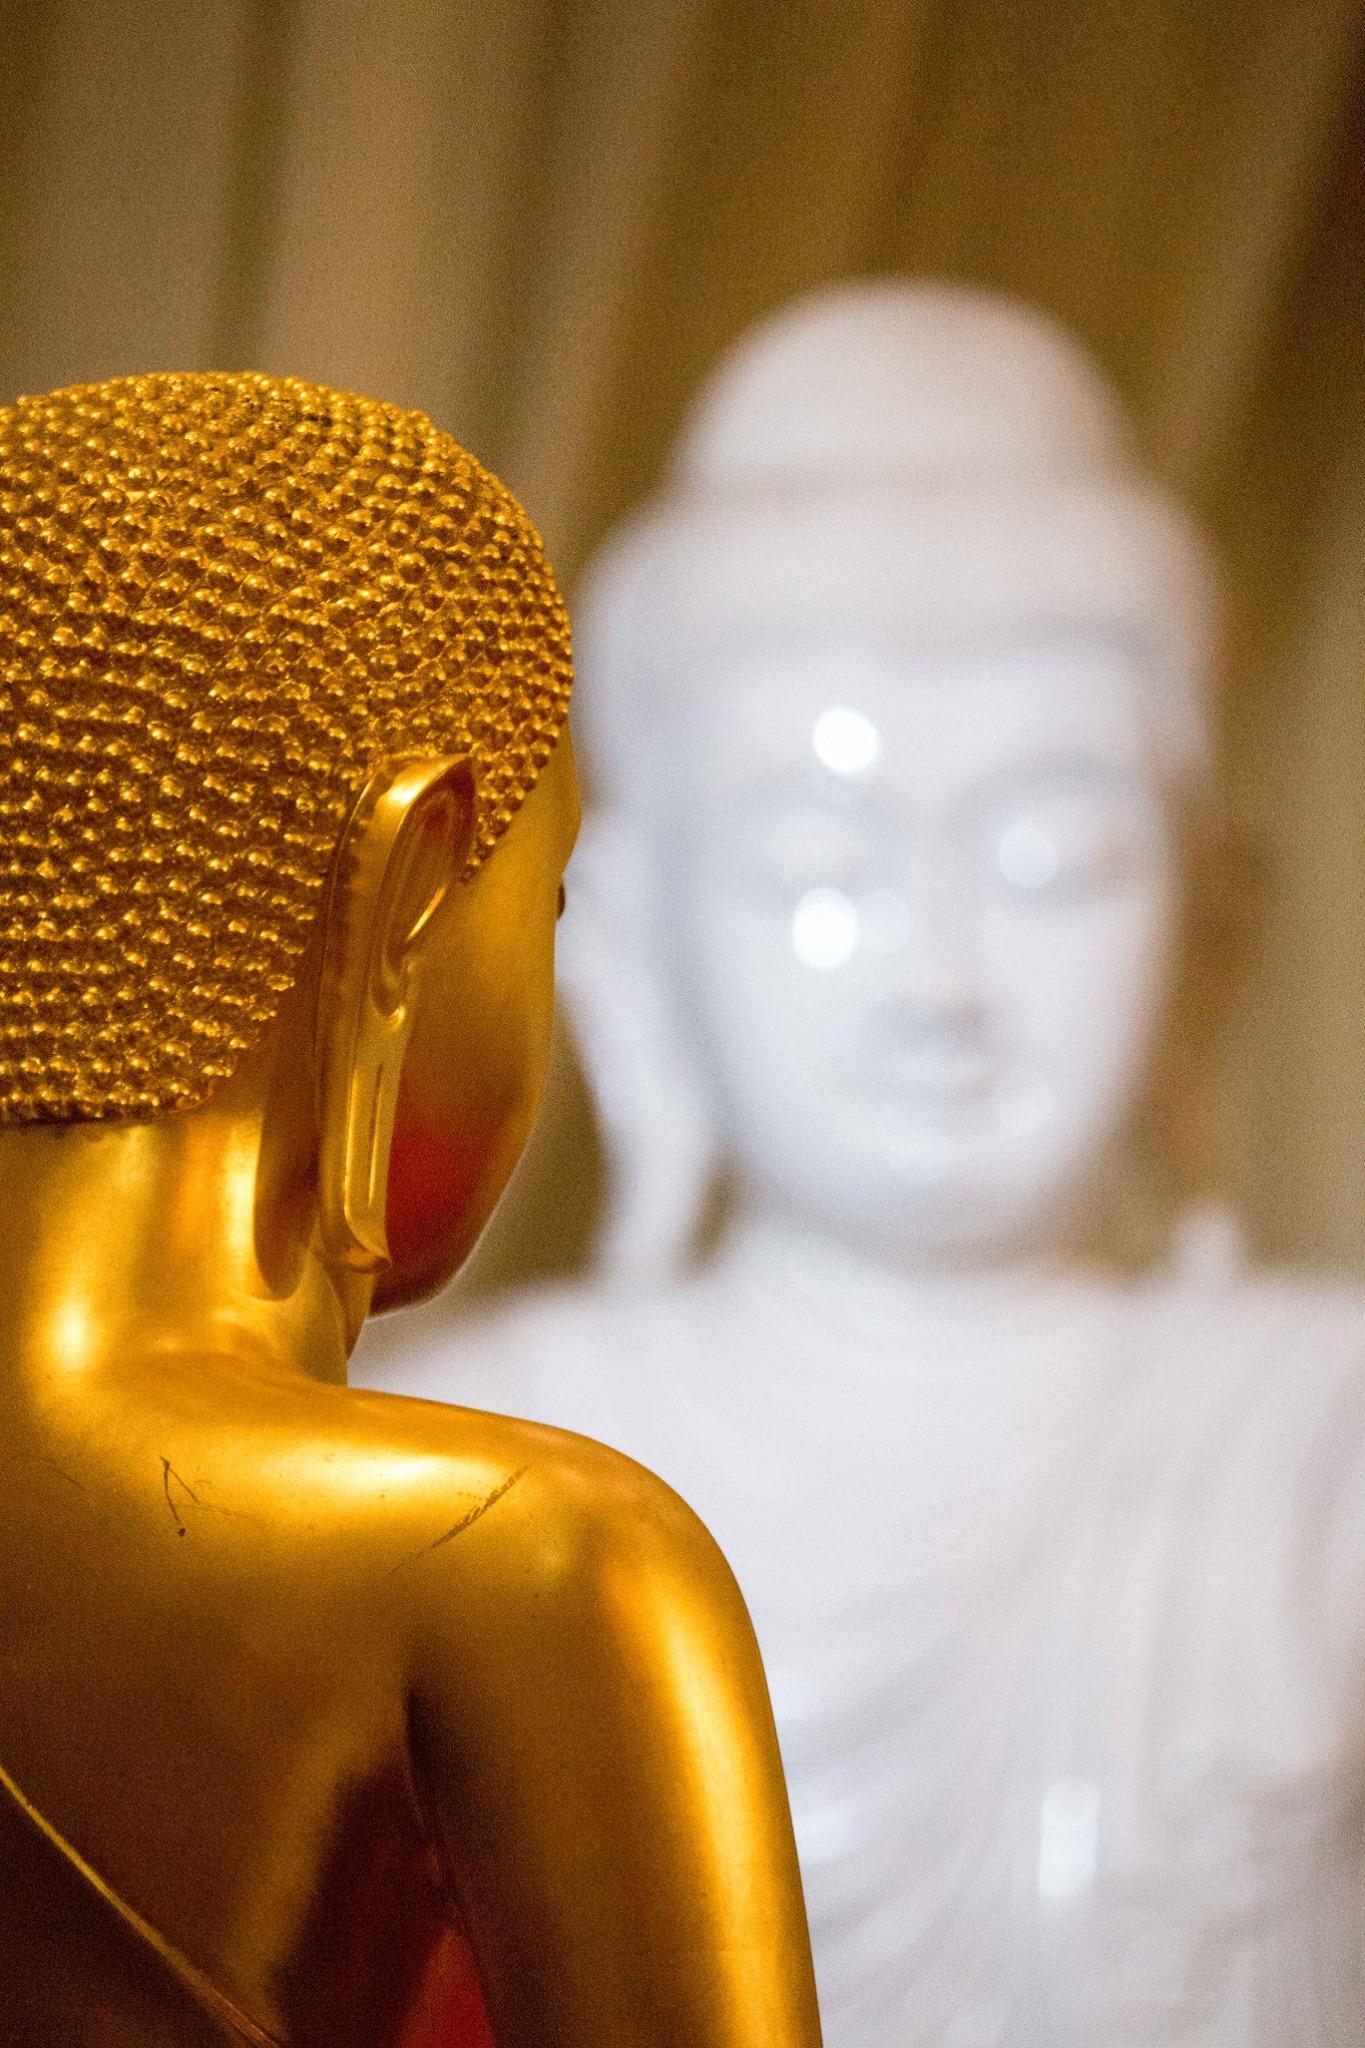 invite-to-paradise-sri-lanka-and-maldives-specialists-travel-agent-tour-operator-customer-review--feedback-joel-rhian-buddha-2.jpg